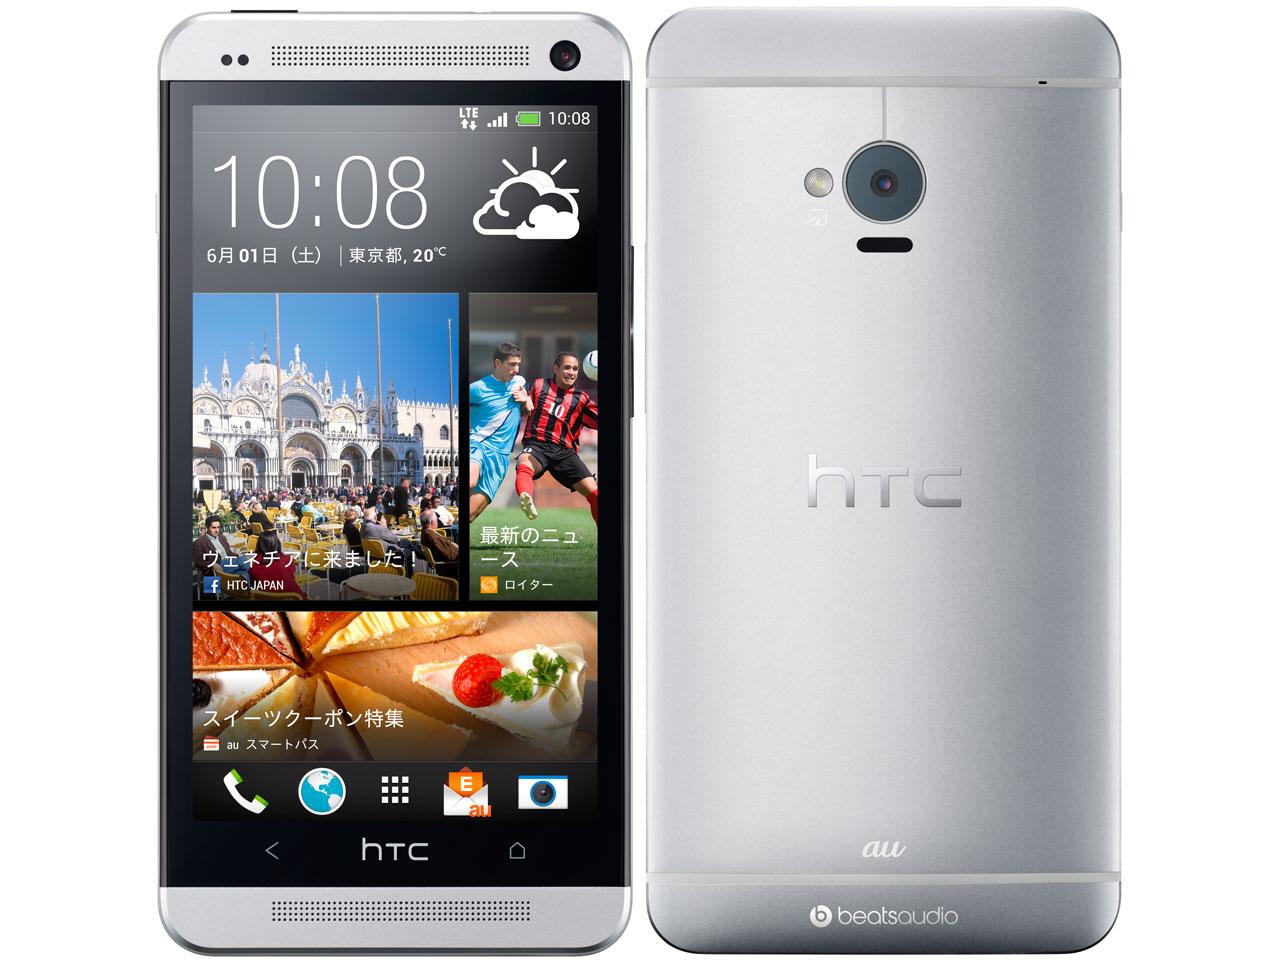 HTC J One HTL22 au [ホワイトメタル] の製品画像